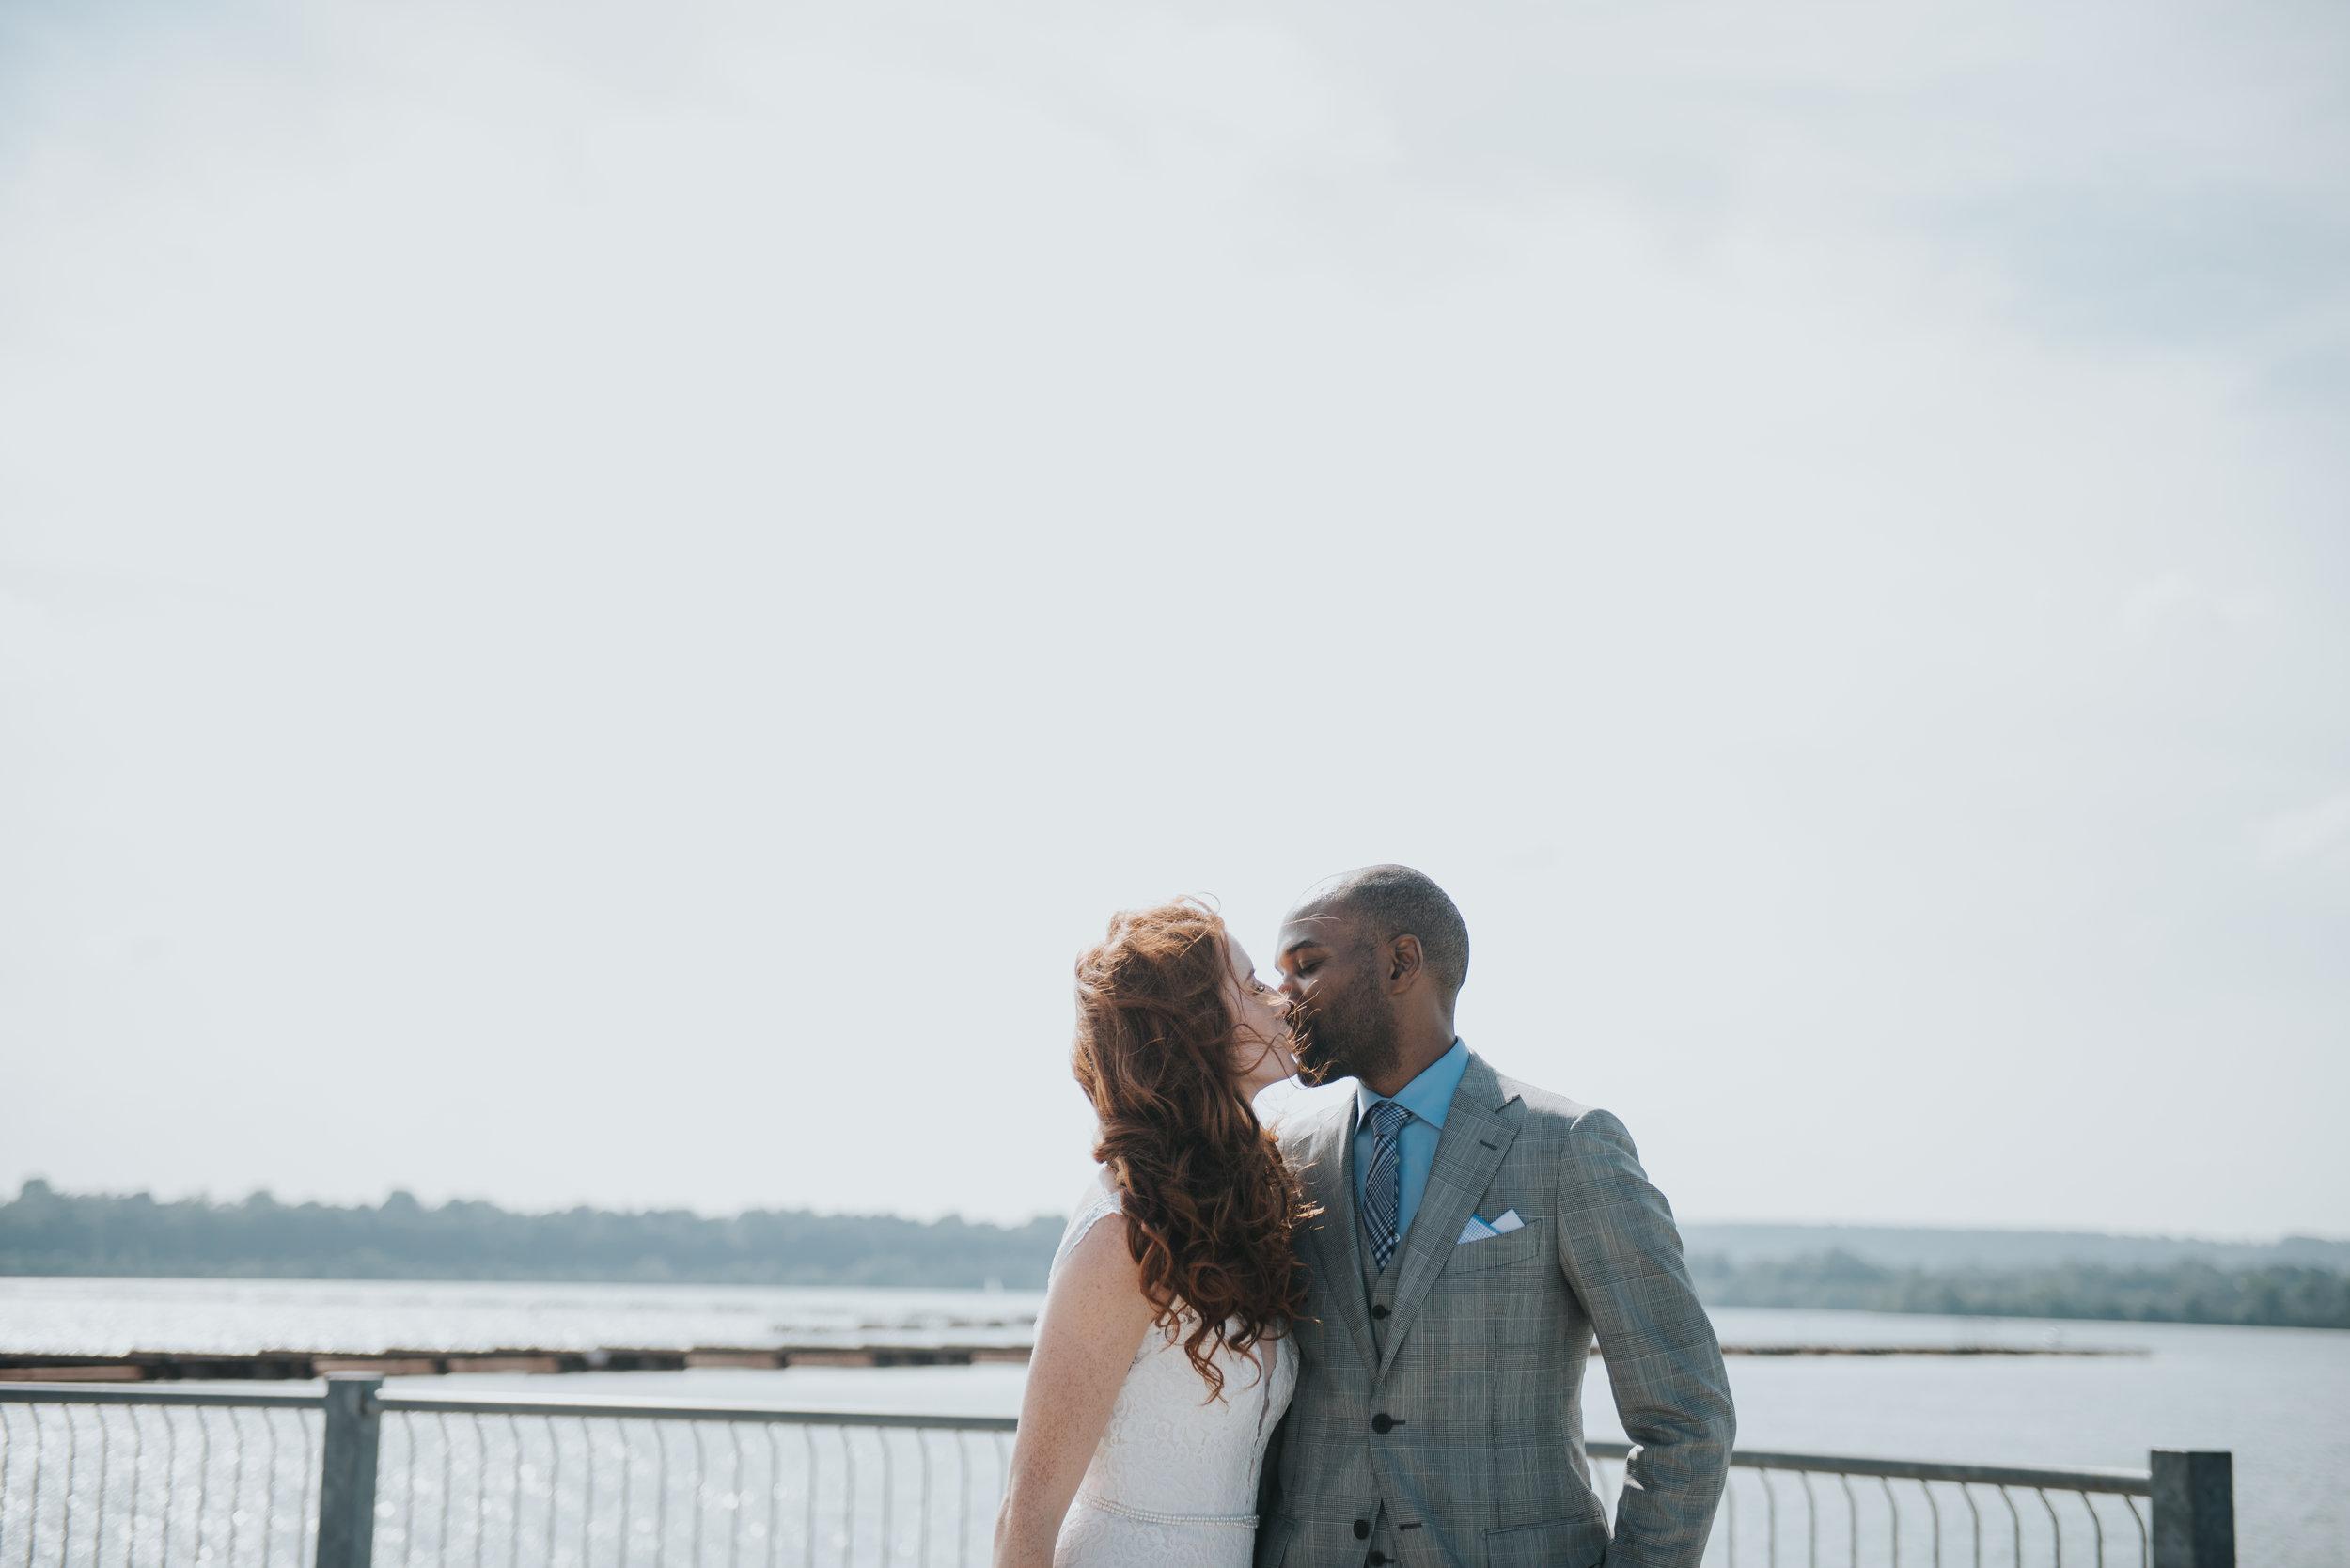 bride-groom-kissing-toronto-outdoor-summer-wedding-documentary-wedding-photography-by-willow-birch-photo.jpg